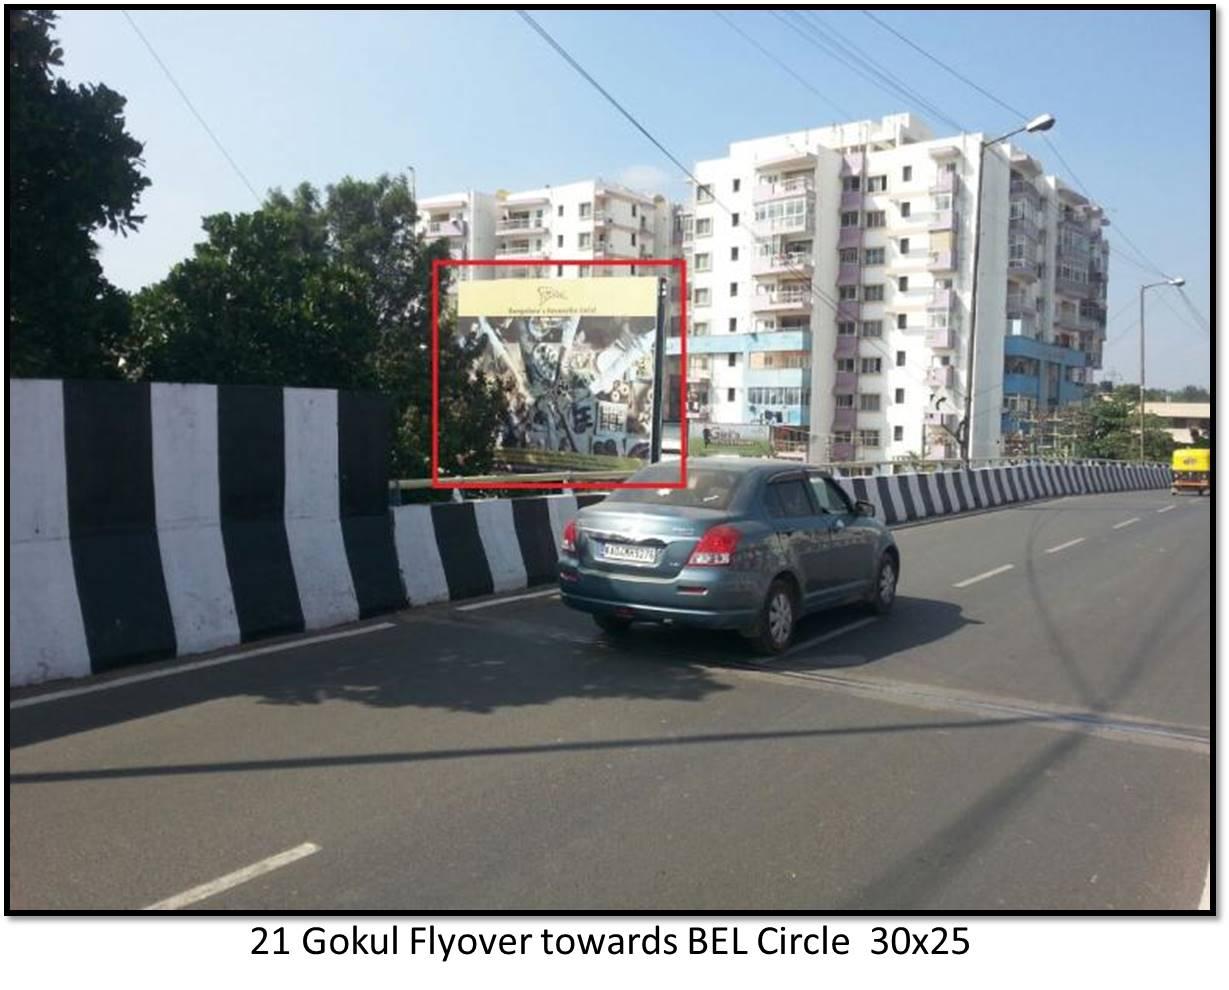 Gokul Flyover, Bengaluru